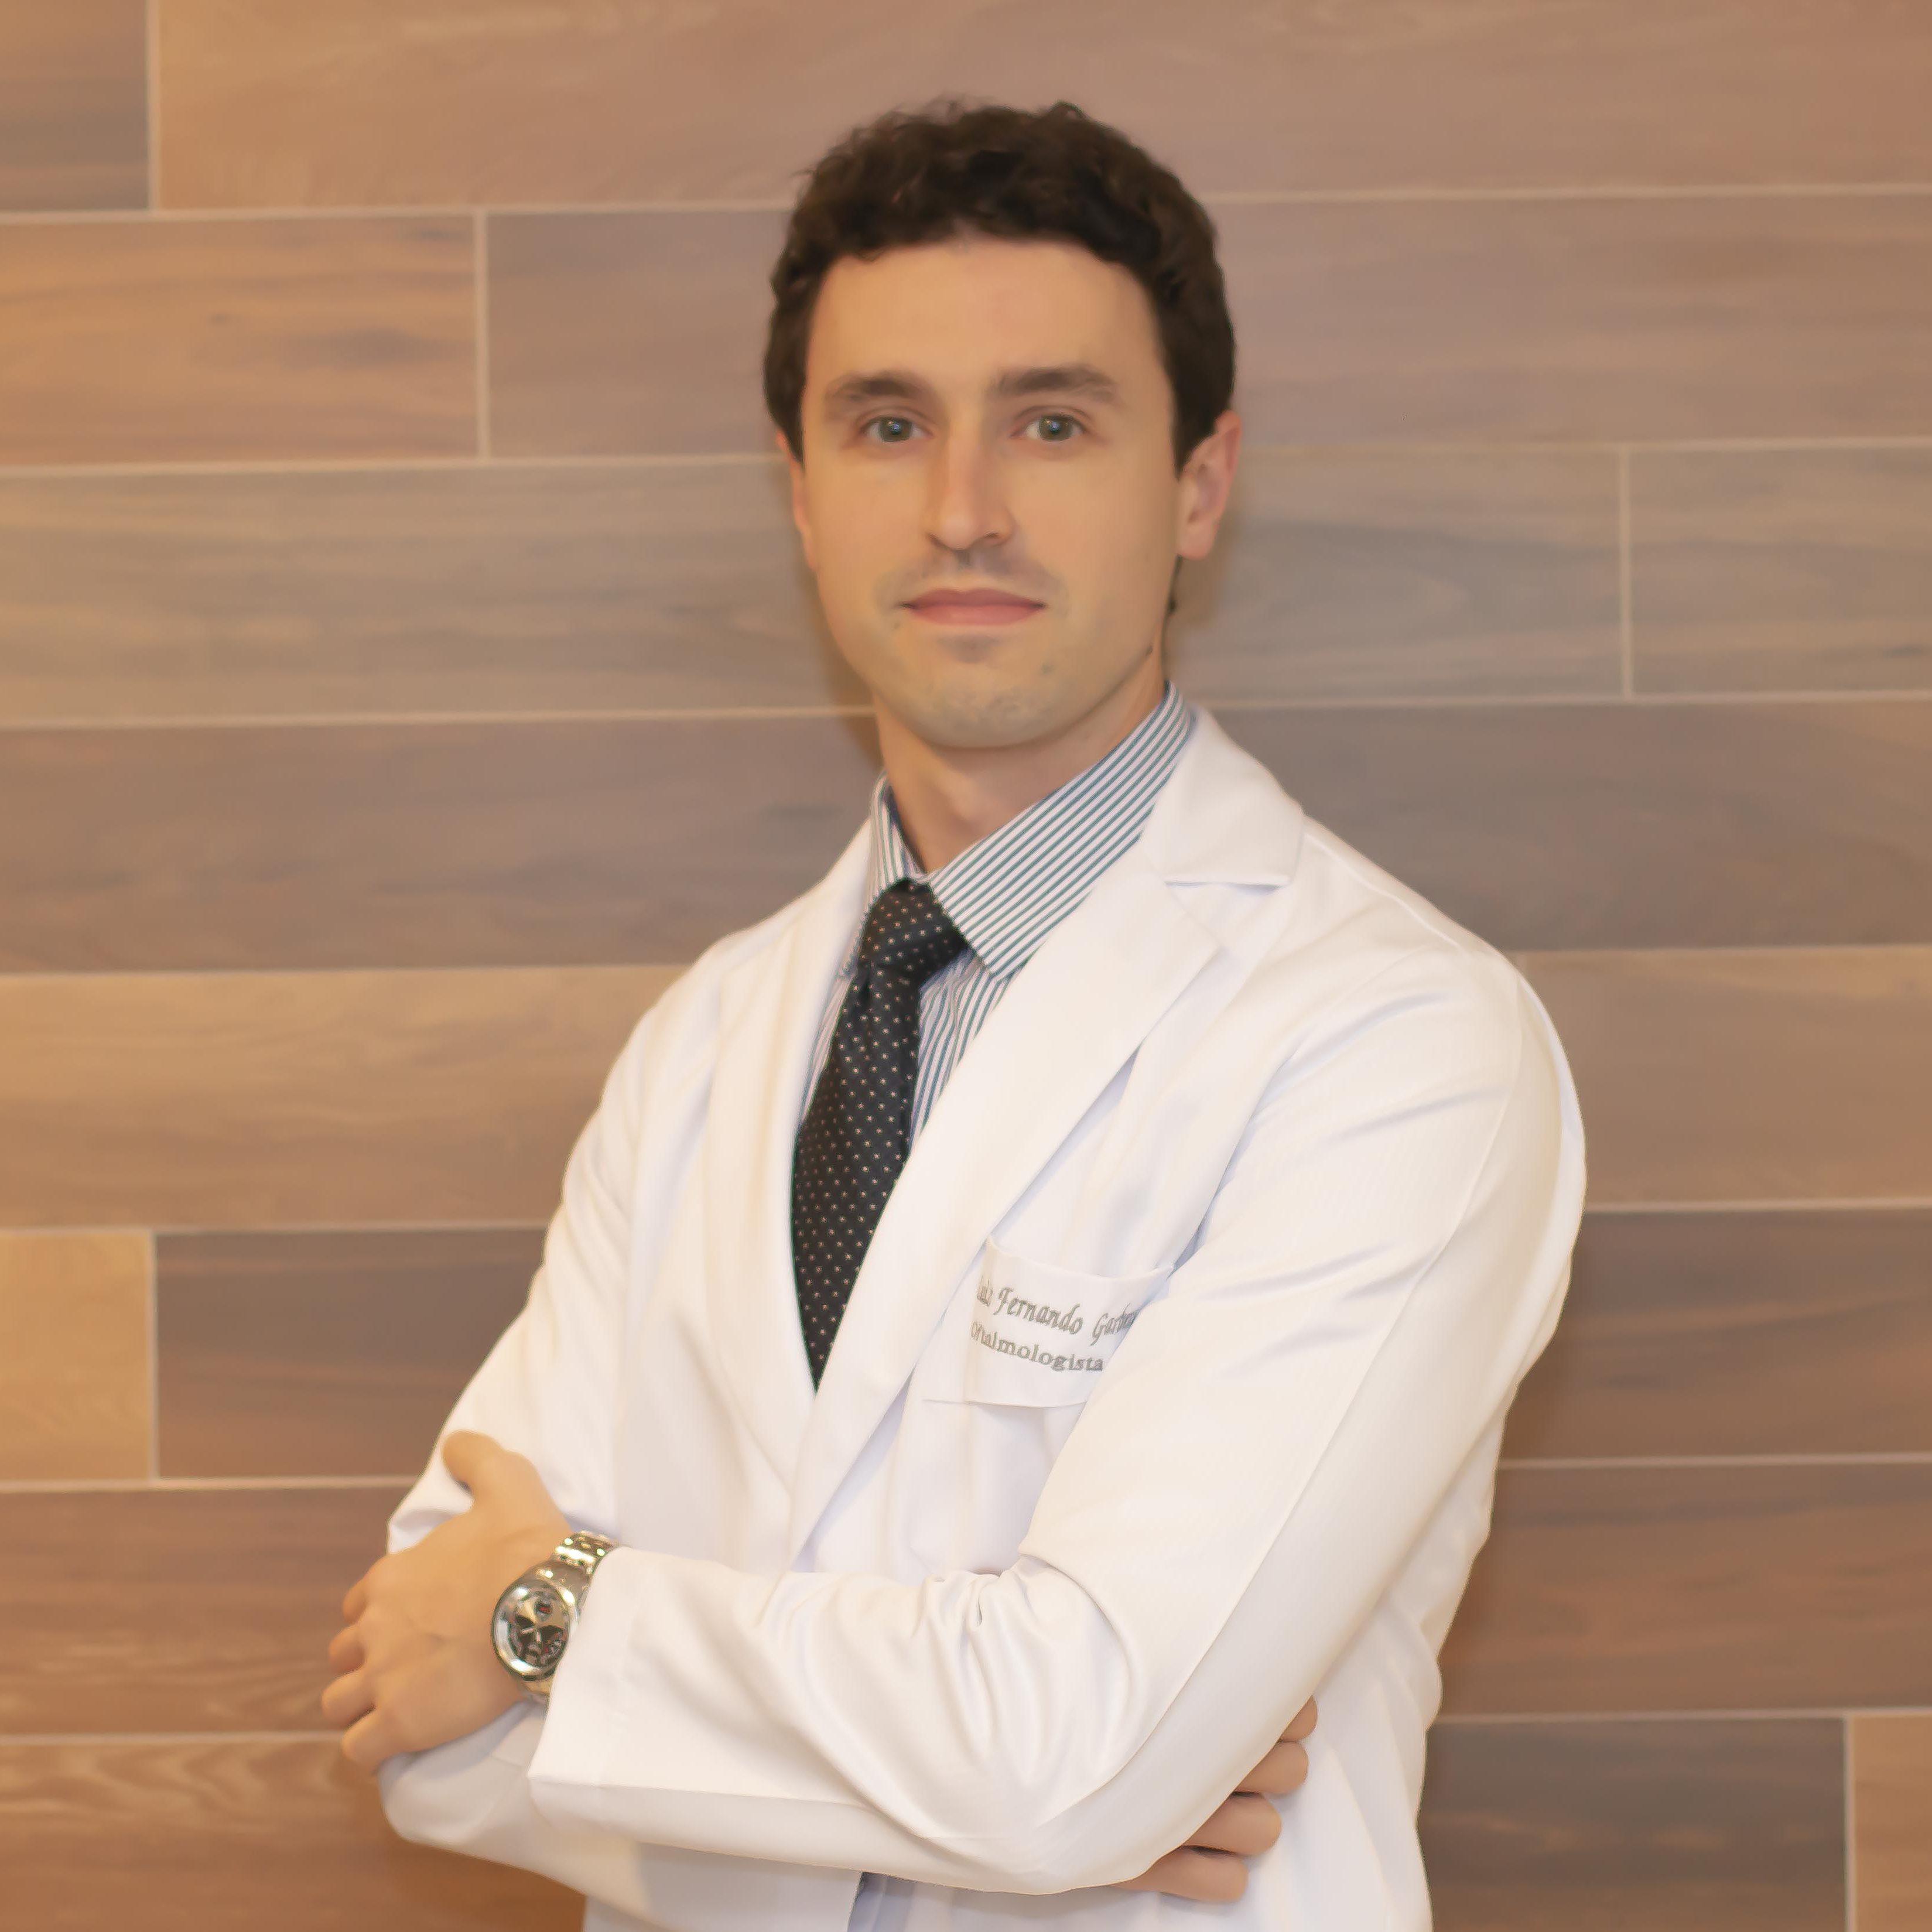 Dr. Luiz Fernando Garbers